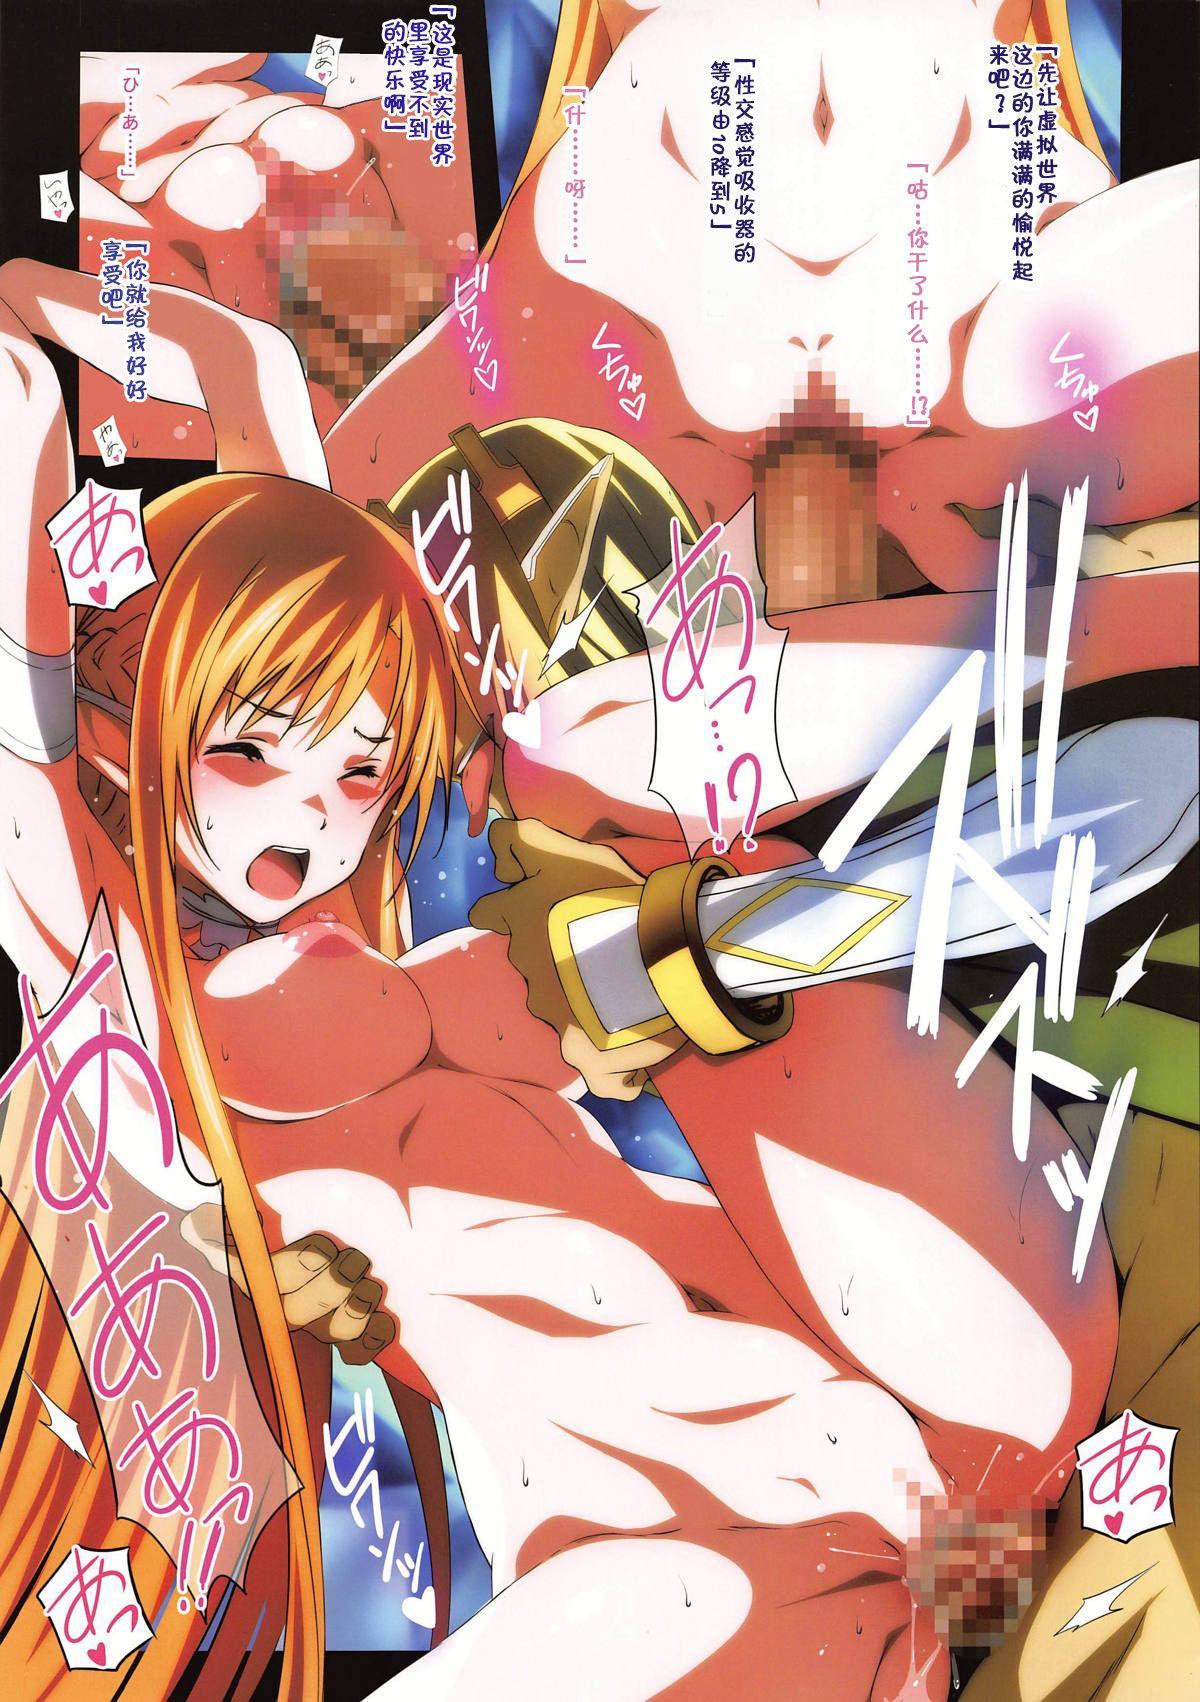 Sword Art Lilycization. 7